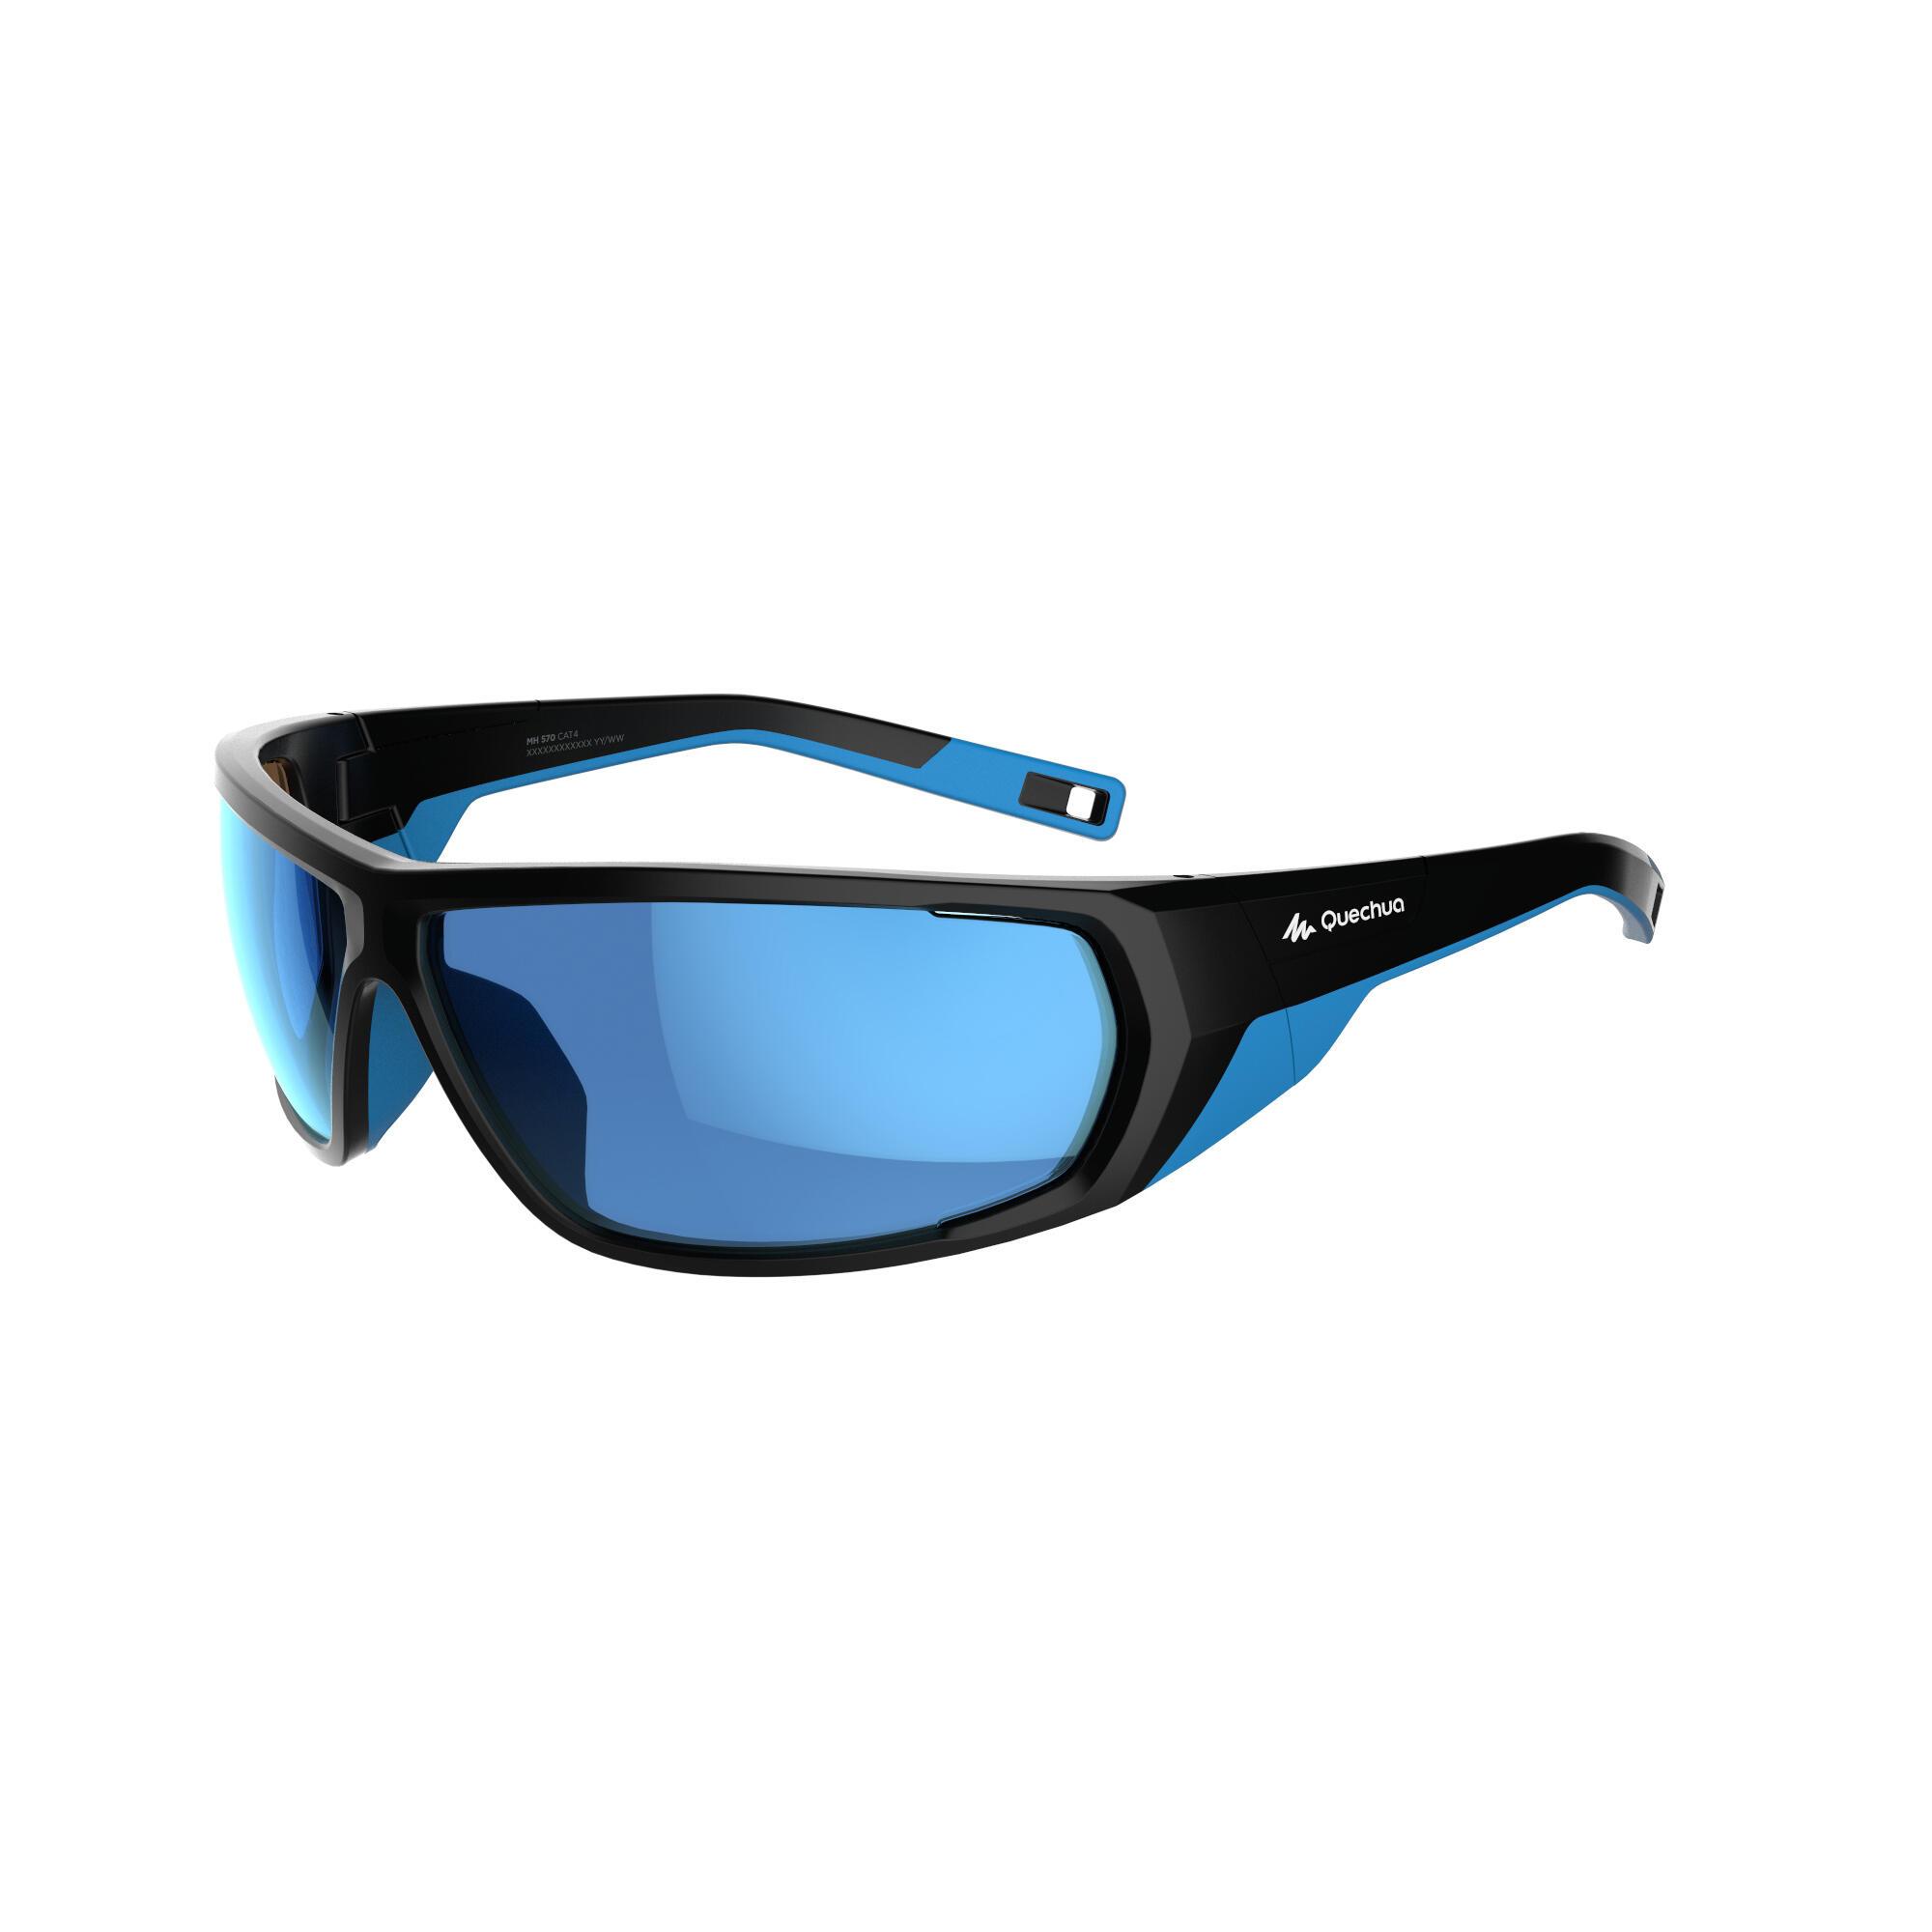 Quechua Skibrillen volwassenen Skiing 700 zwart & blauw categorie 4